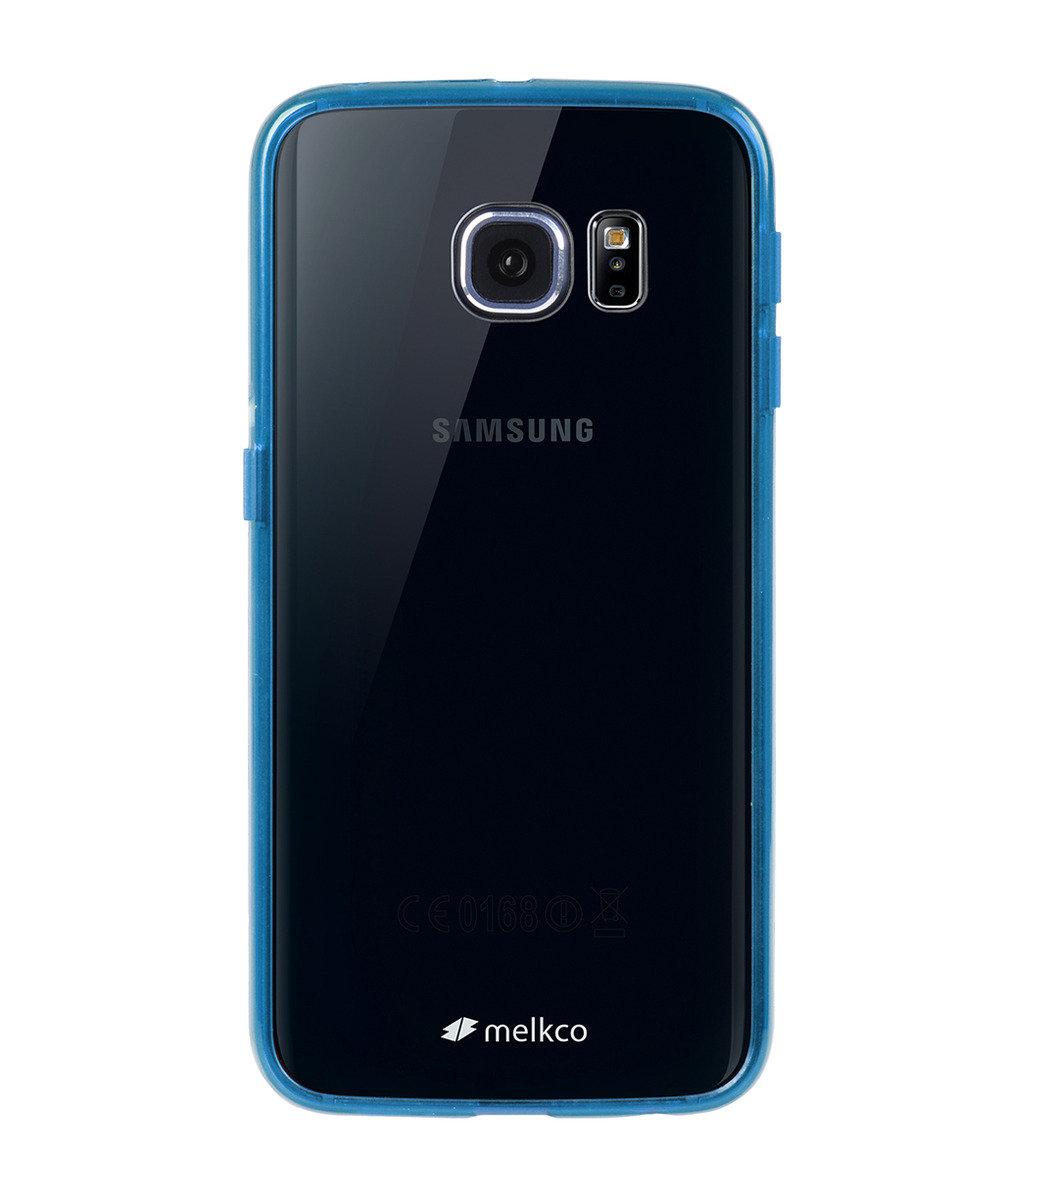 Galaxy S6 Edge PolyUltima 手機保護殼 - 透明藍色(附送屏幕保護貼)